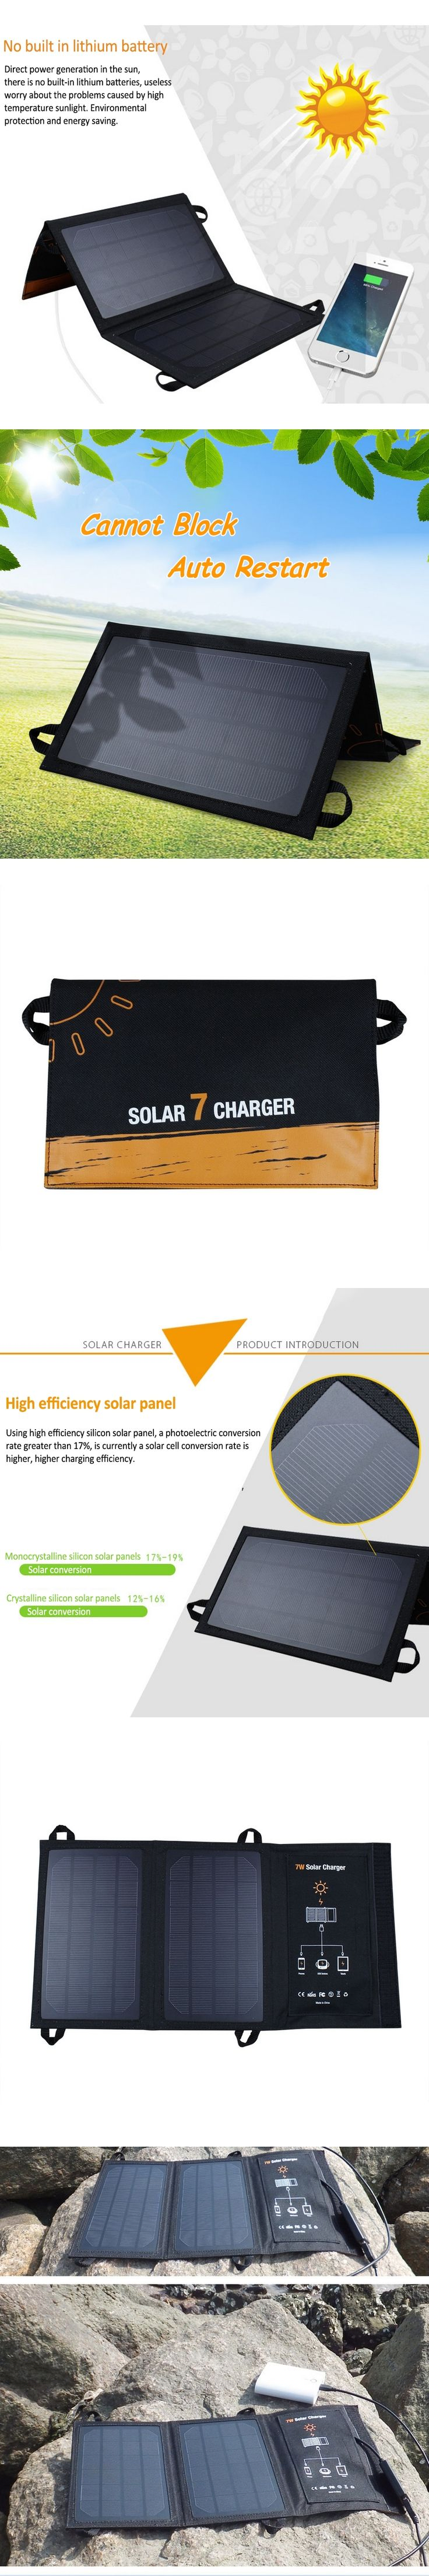 Portable 7W 5V Folding Monocrystalline Solar Panel USB Smart Solar Charger Waterproof No Need Battery